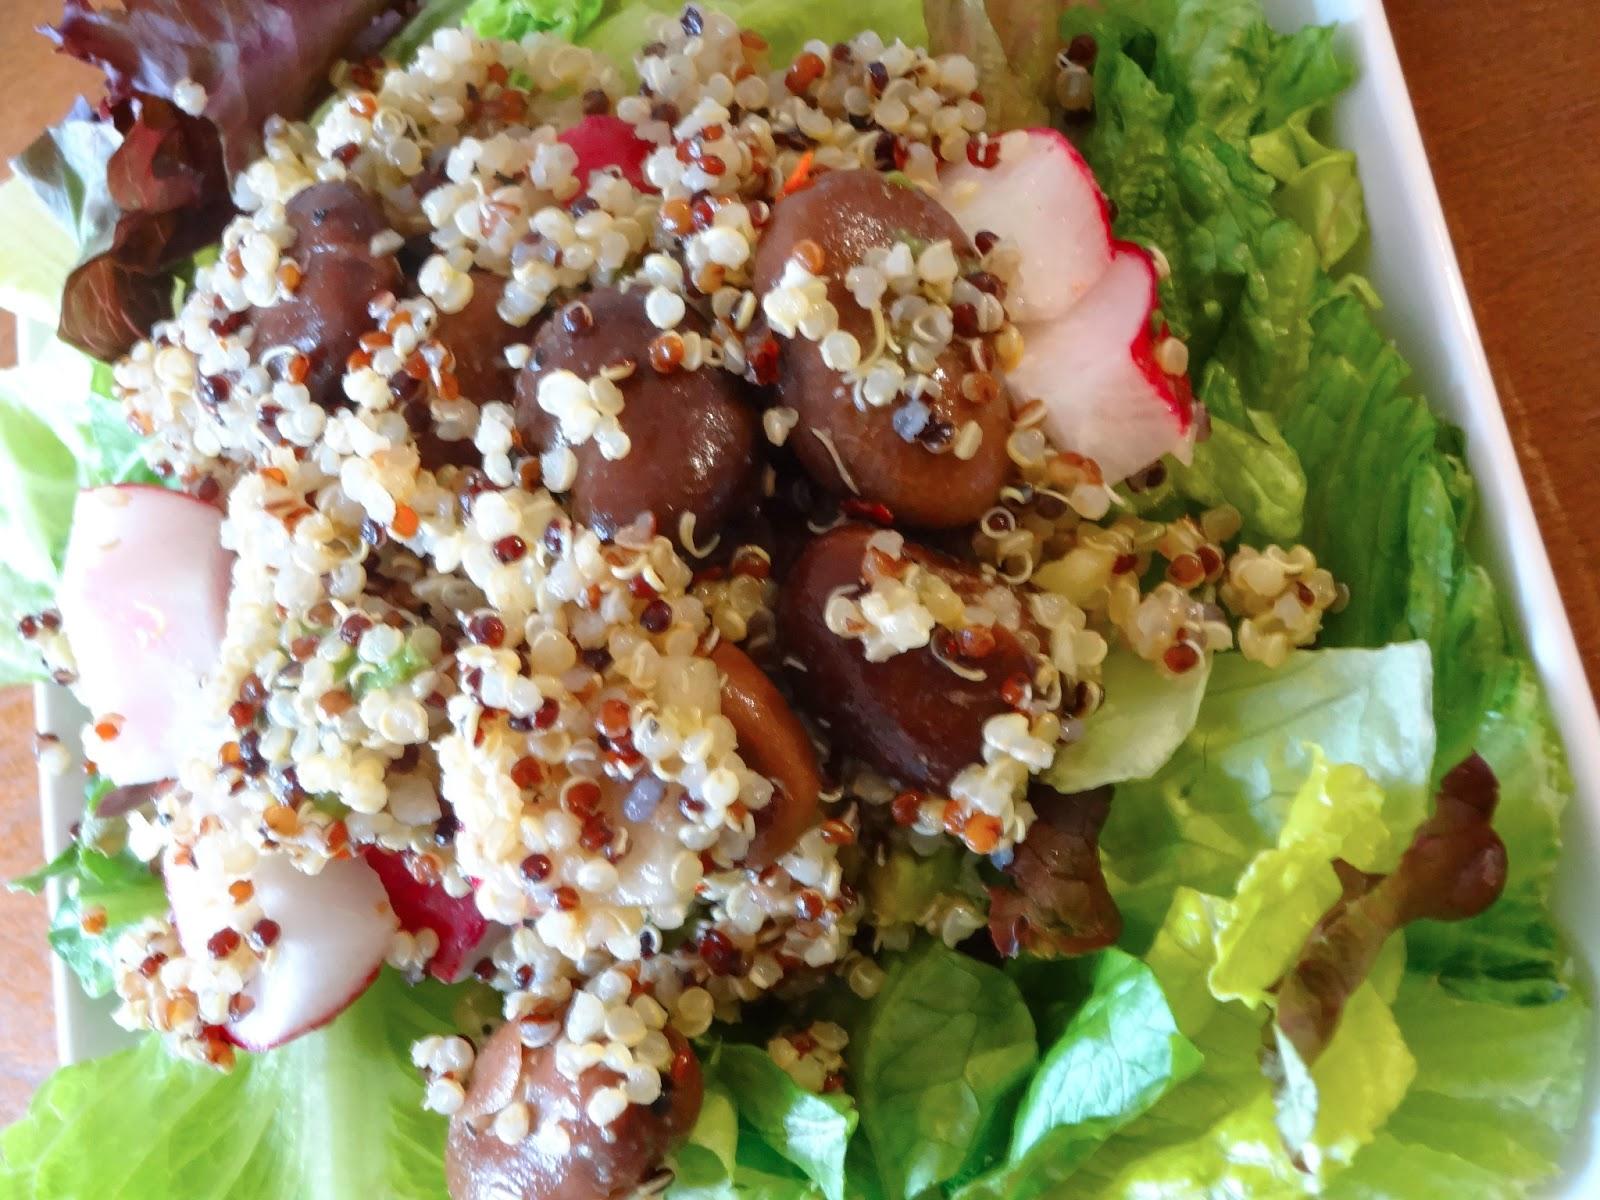 ... quinoa, spice from the radish, and complex carbs (again, quinoa